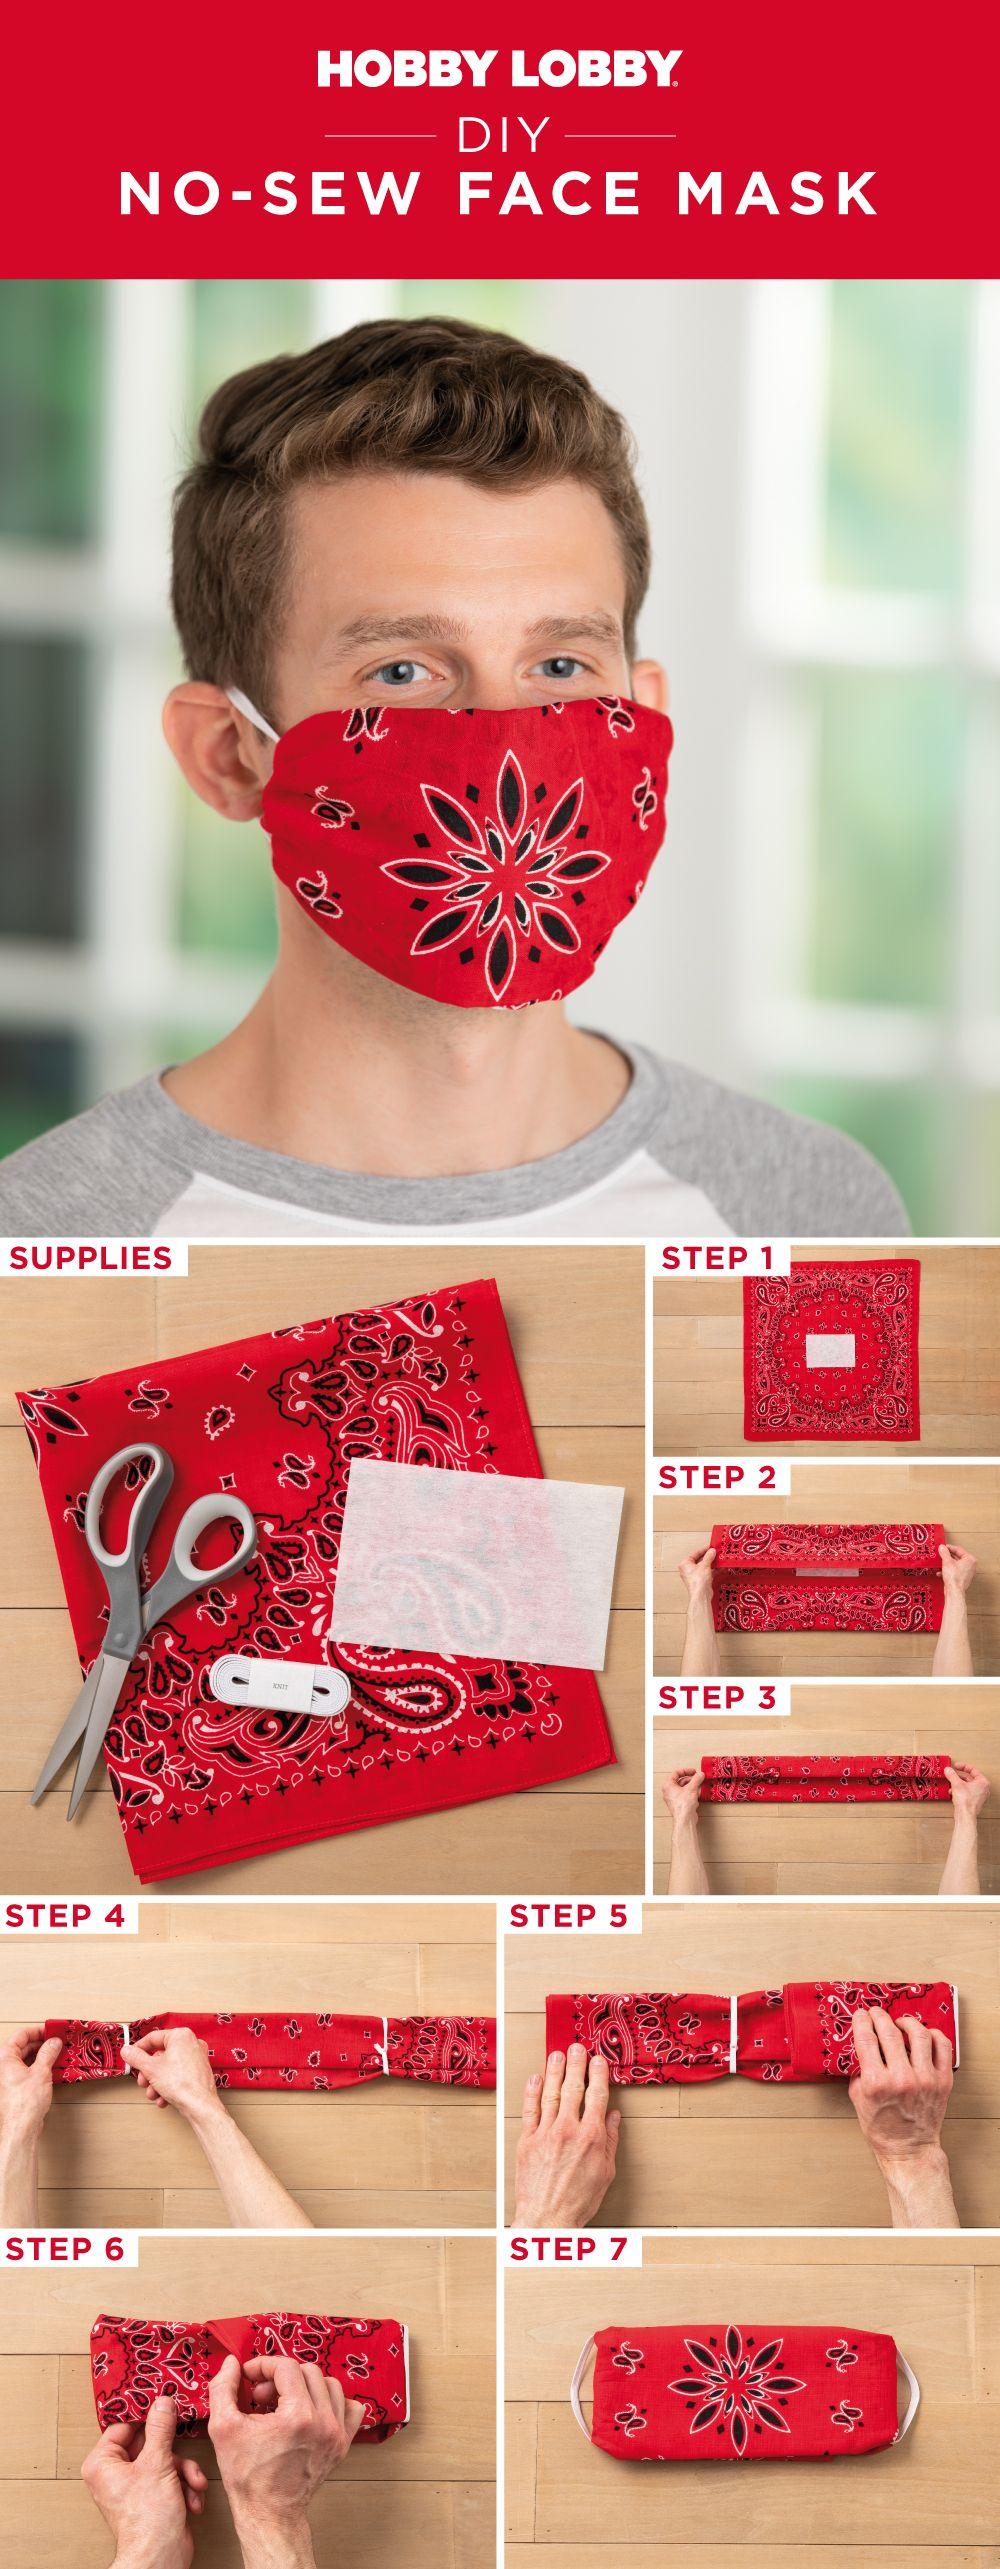 Photo of DIY No-Sew Face Mask